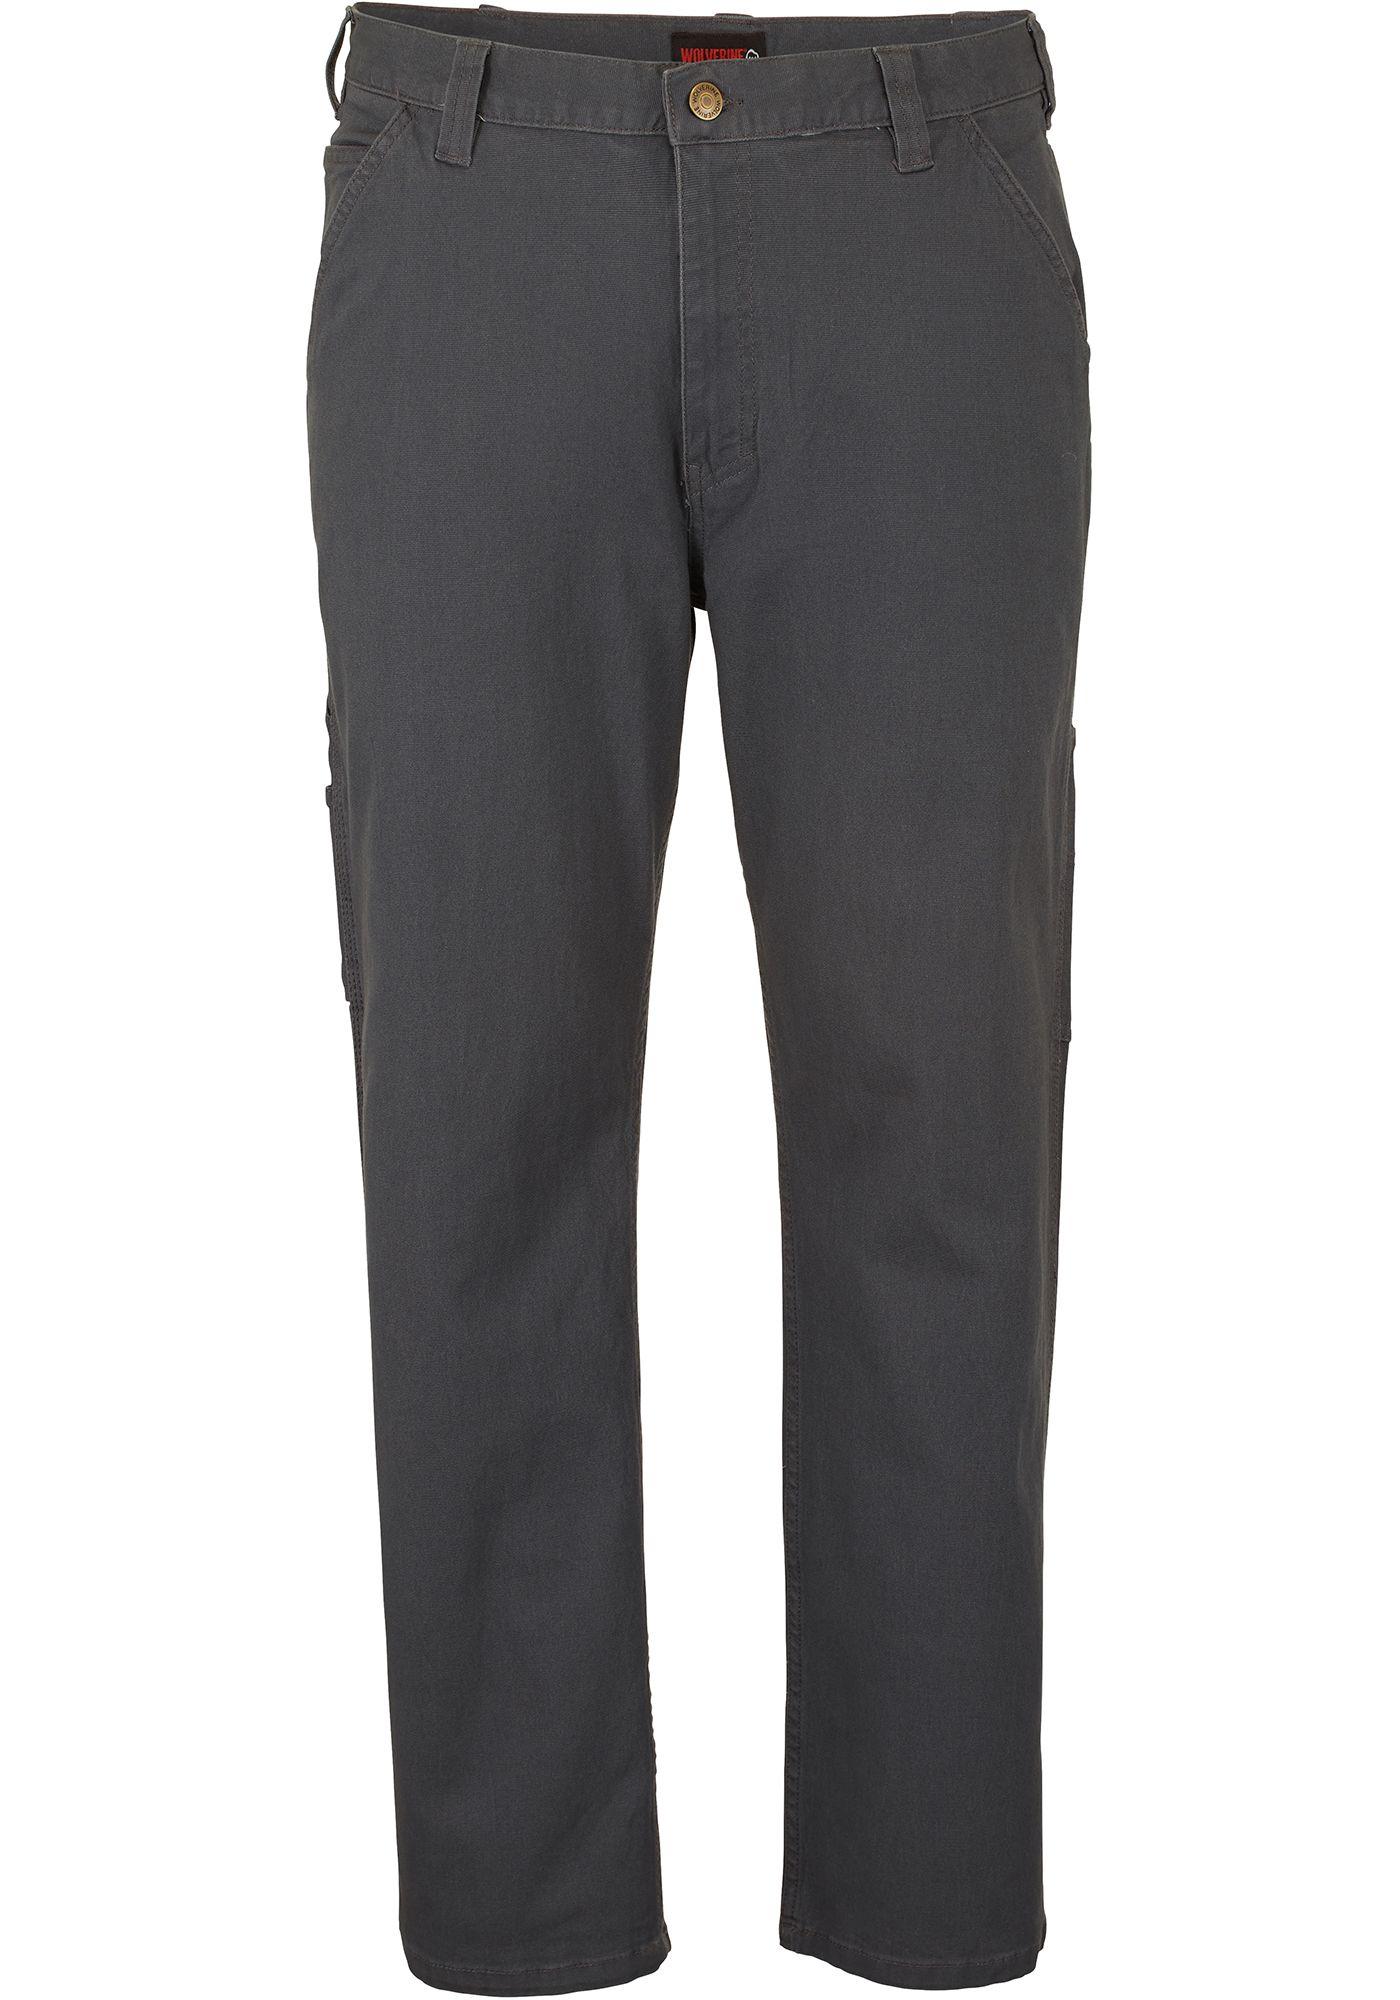 Wolverine Men's Steelhead Stretch Pants (Regular and Big & Tall)